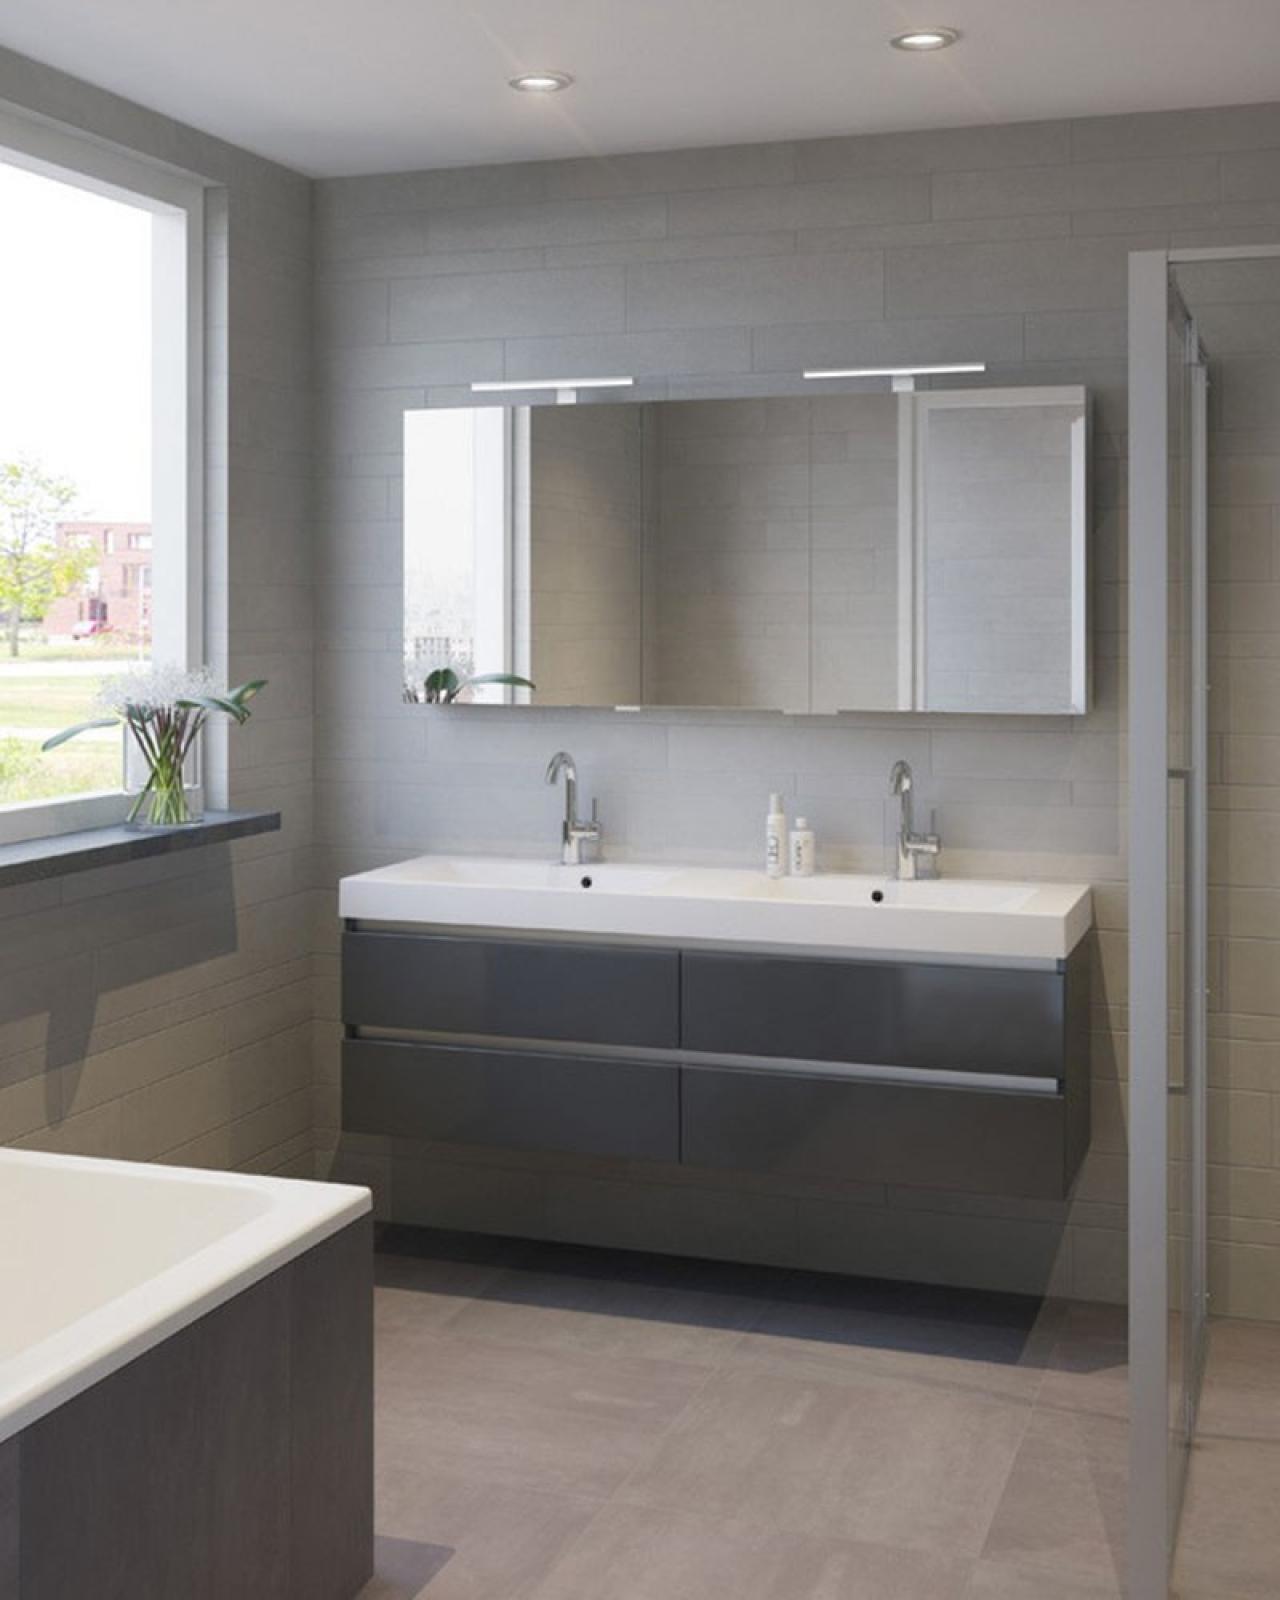 wastafel en badkamerkast badkamer badkamerkast spiegel galerij